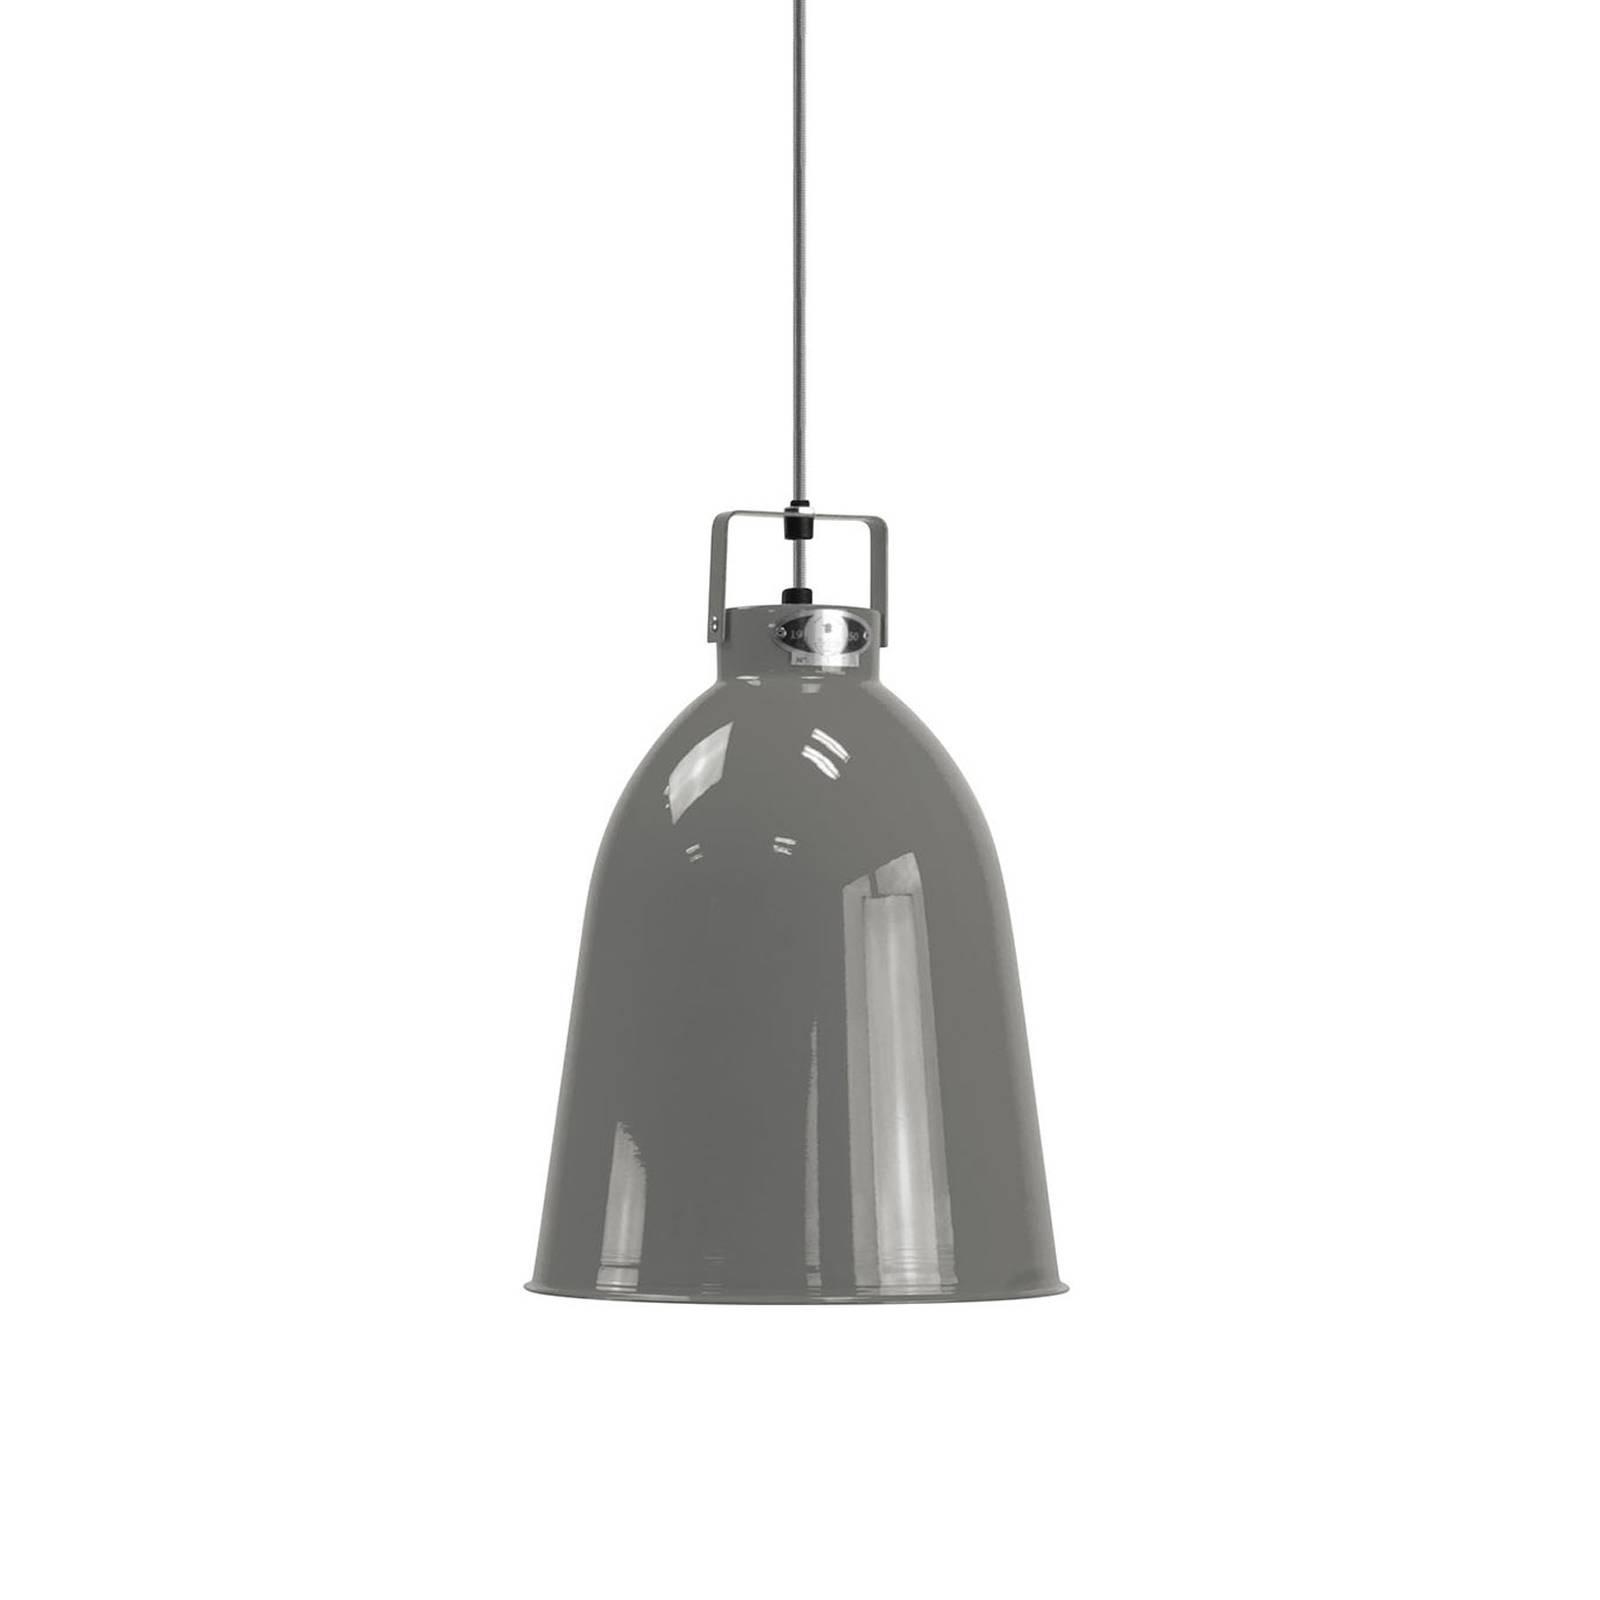 Jieldé Clément C240 -riippuvalo, harmaa Ø 24 cm